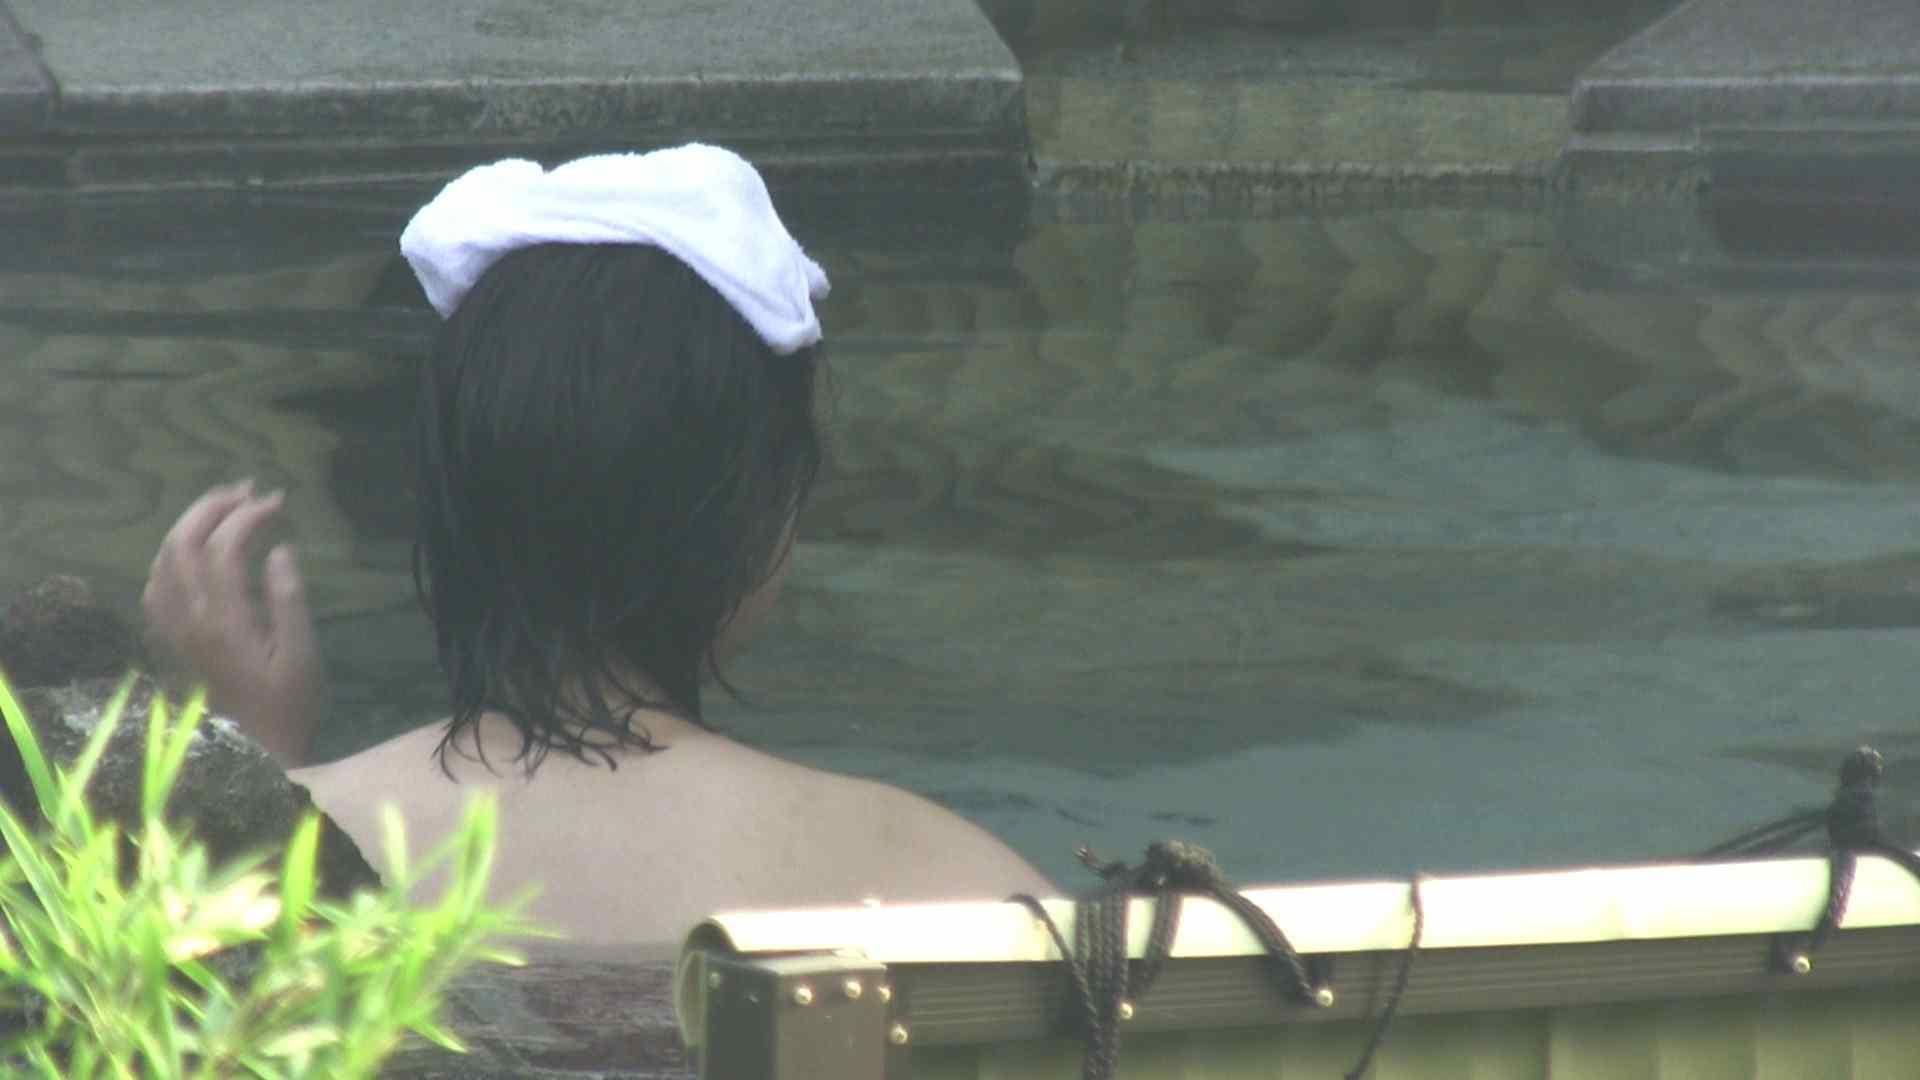 Aquaな露天風呂Vol.172 盗撮映像  113Pix 83